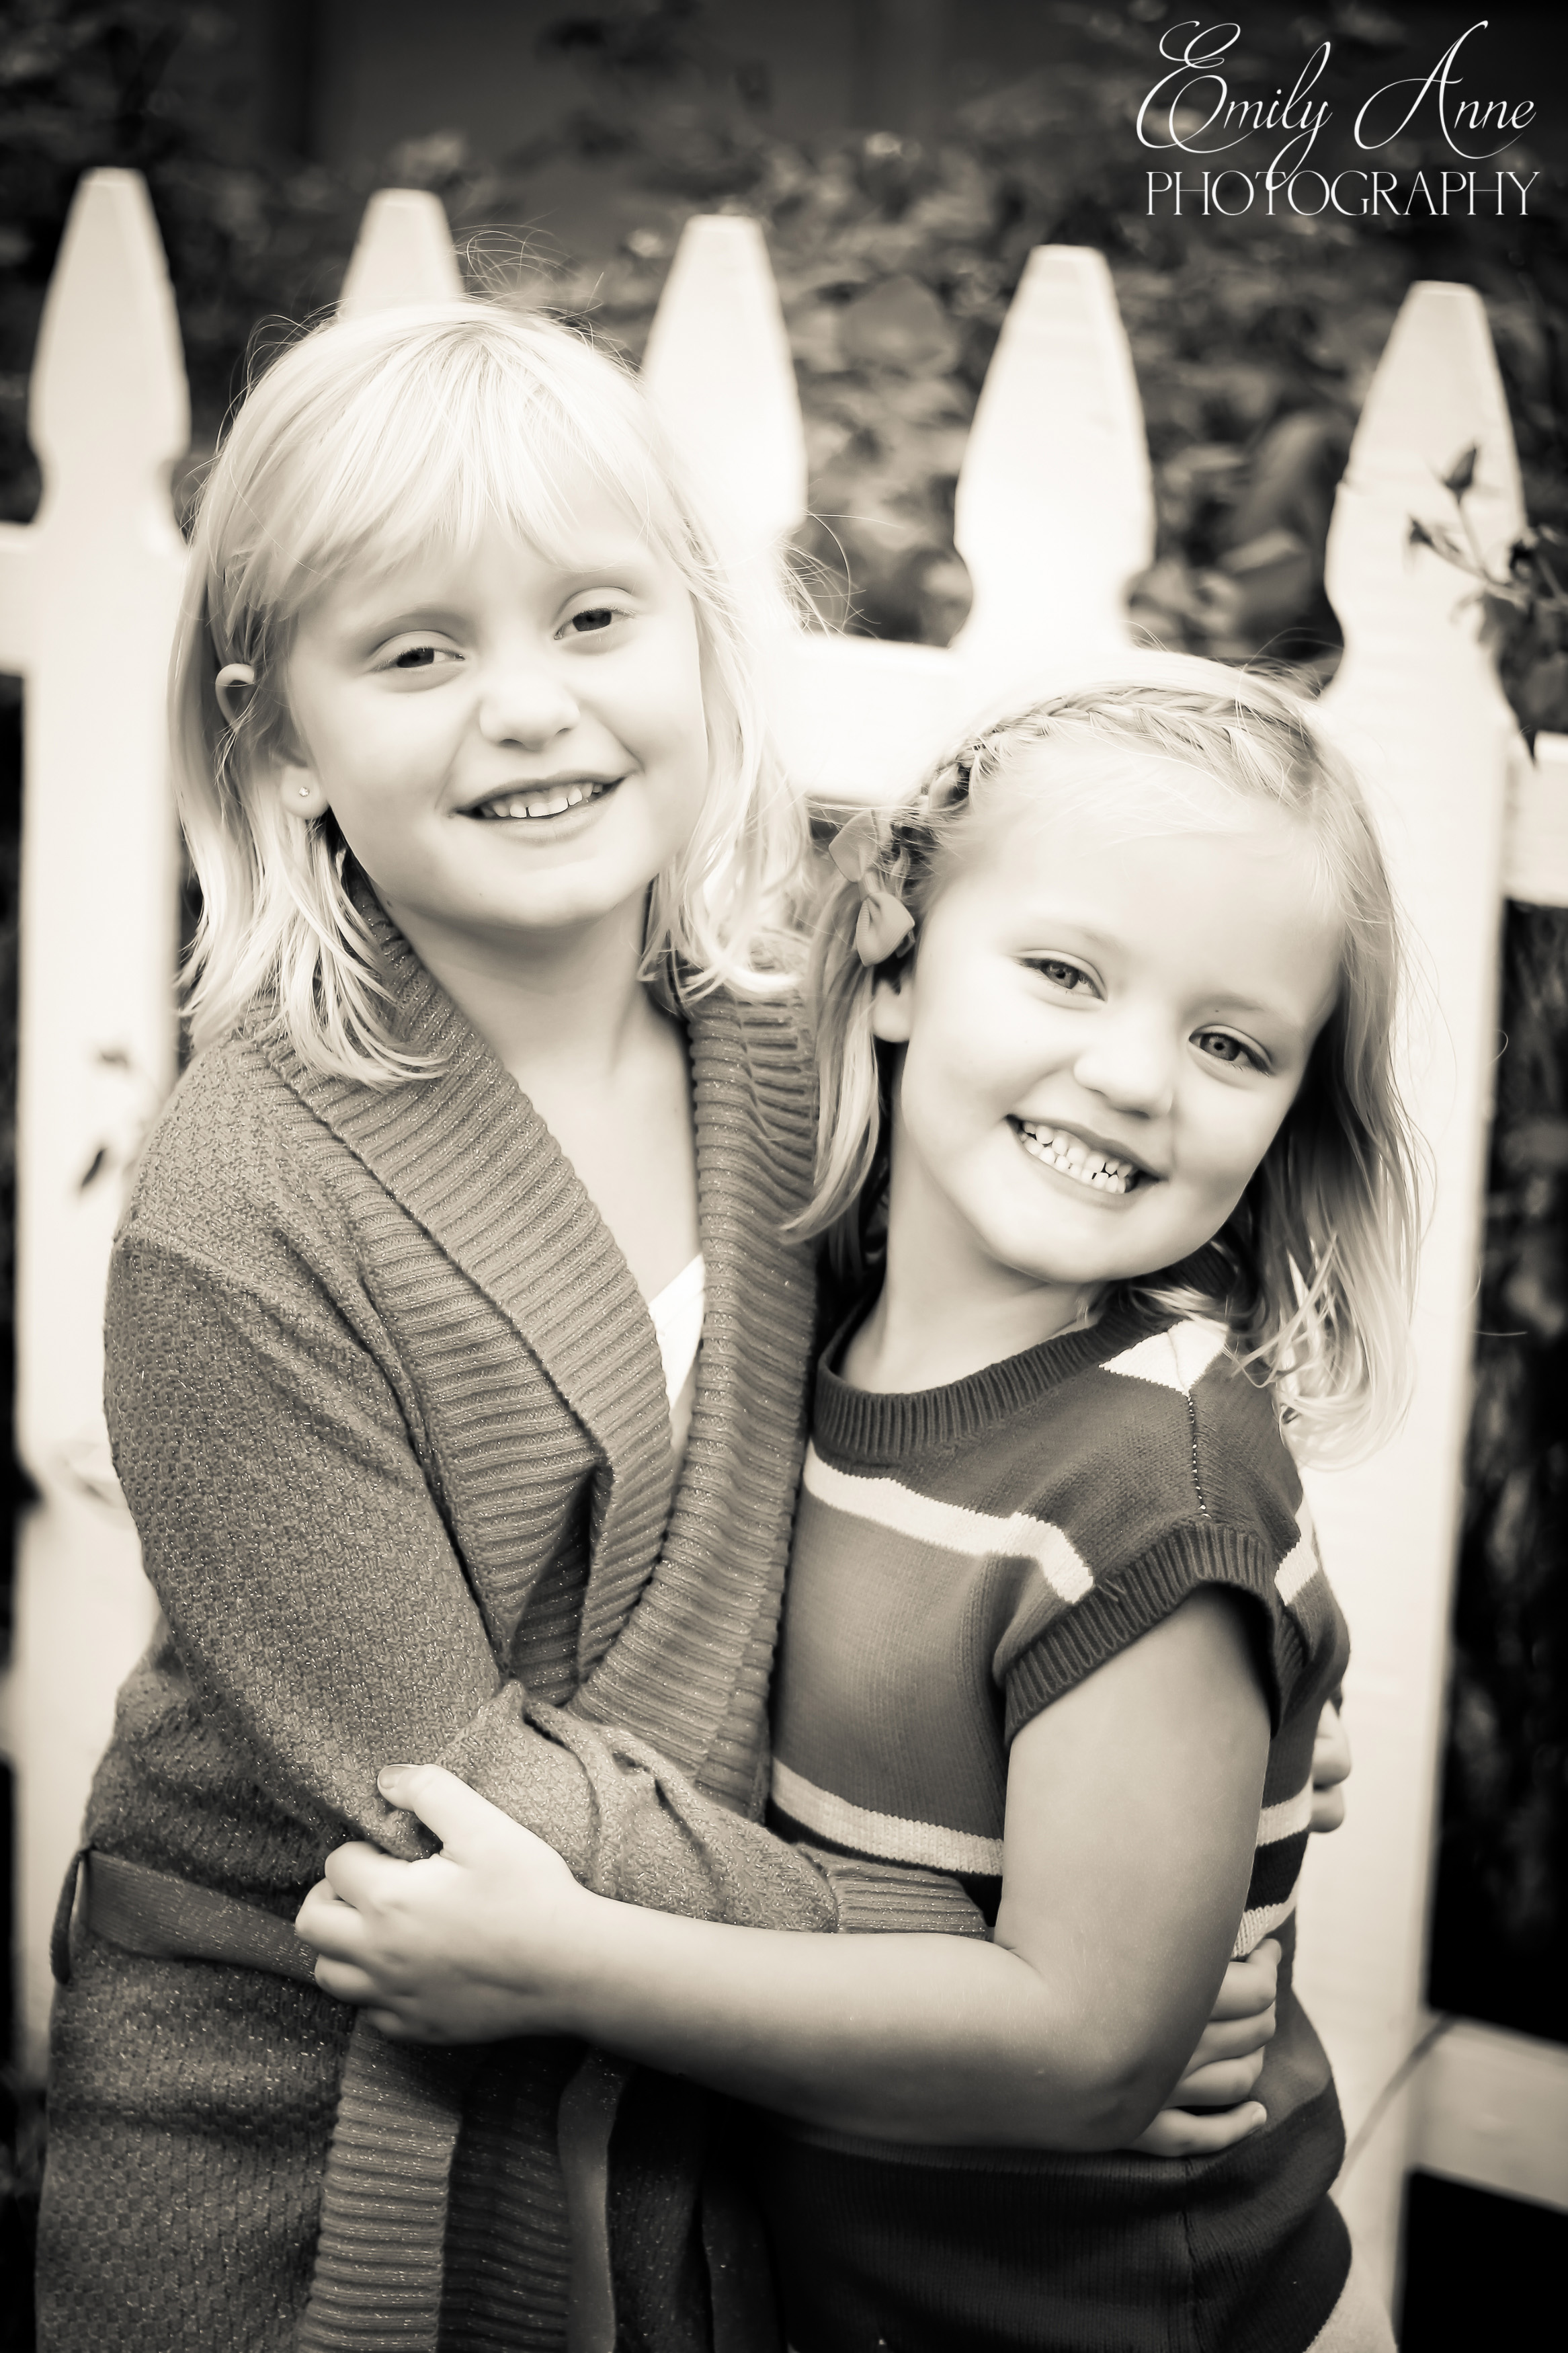 guidetoposingchildreninelementaryschoolemilyannephotographyemilyannephotoart